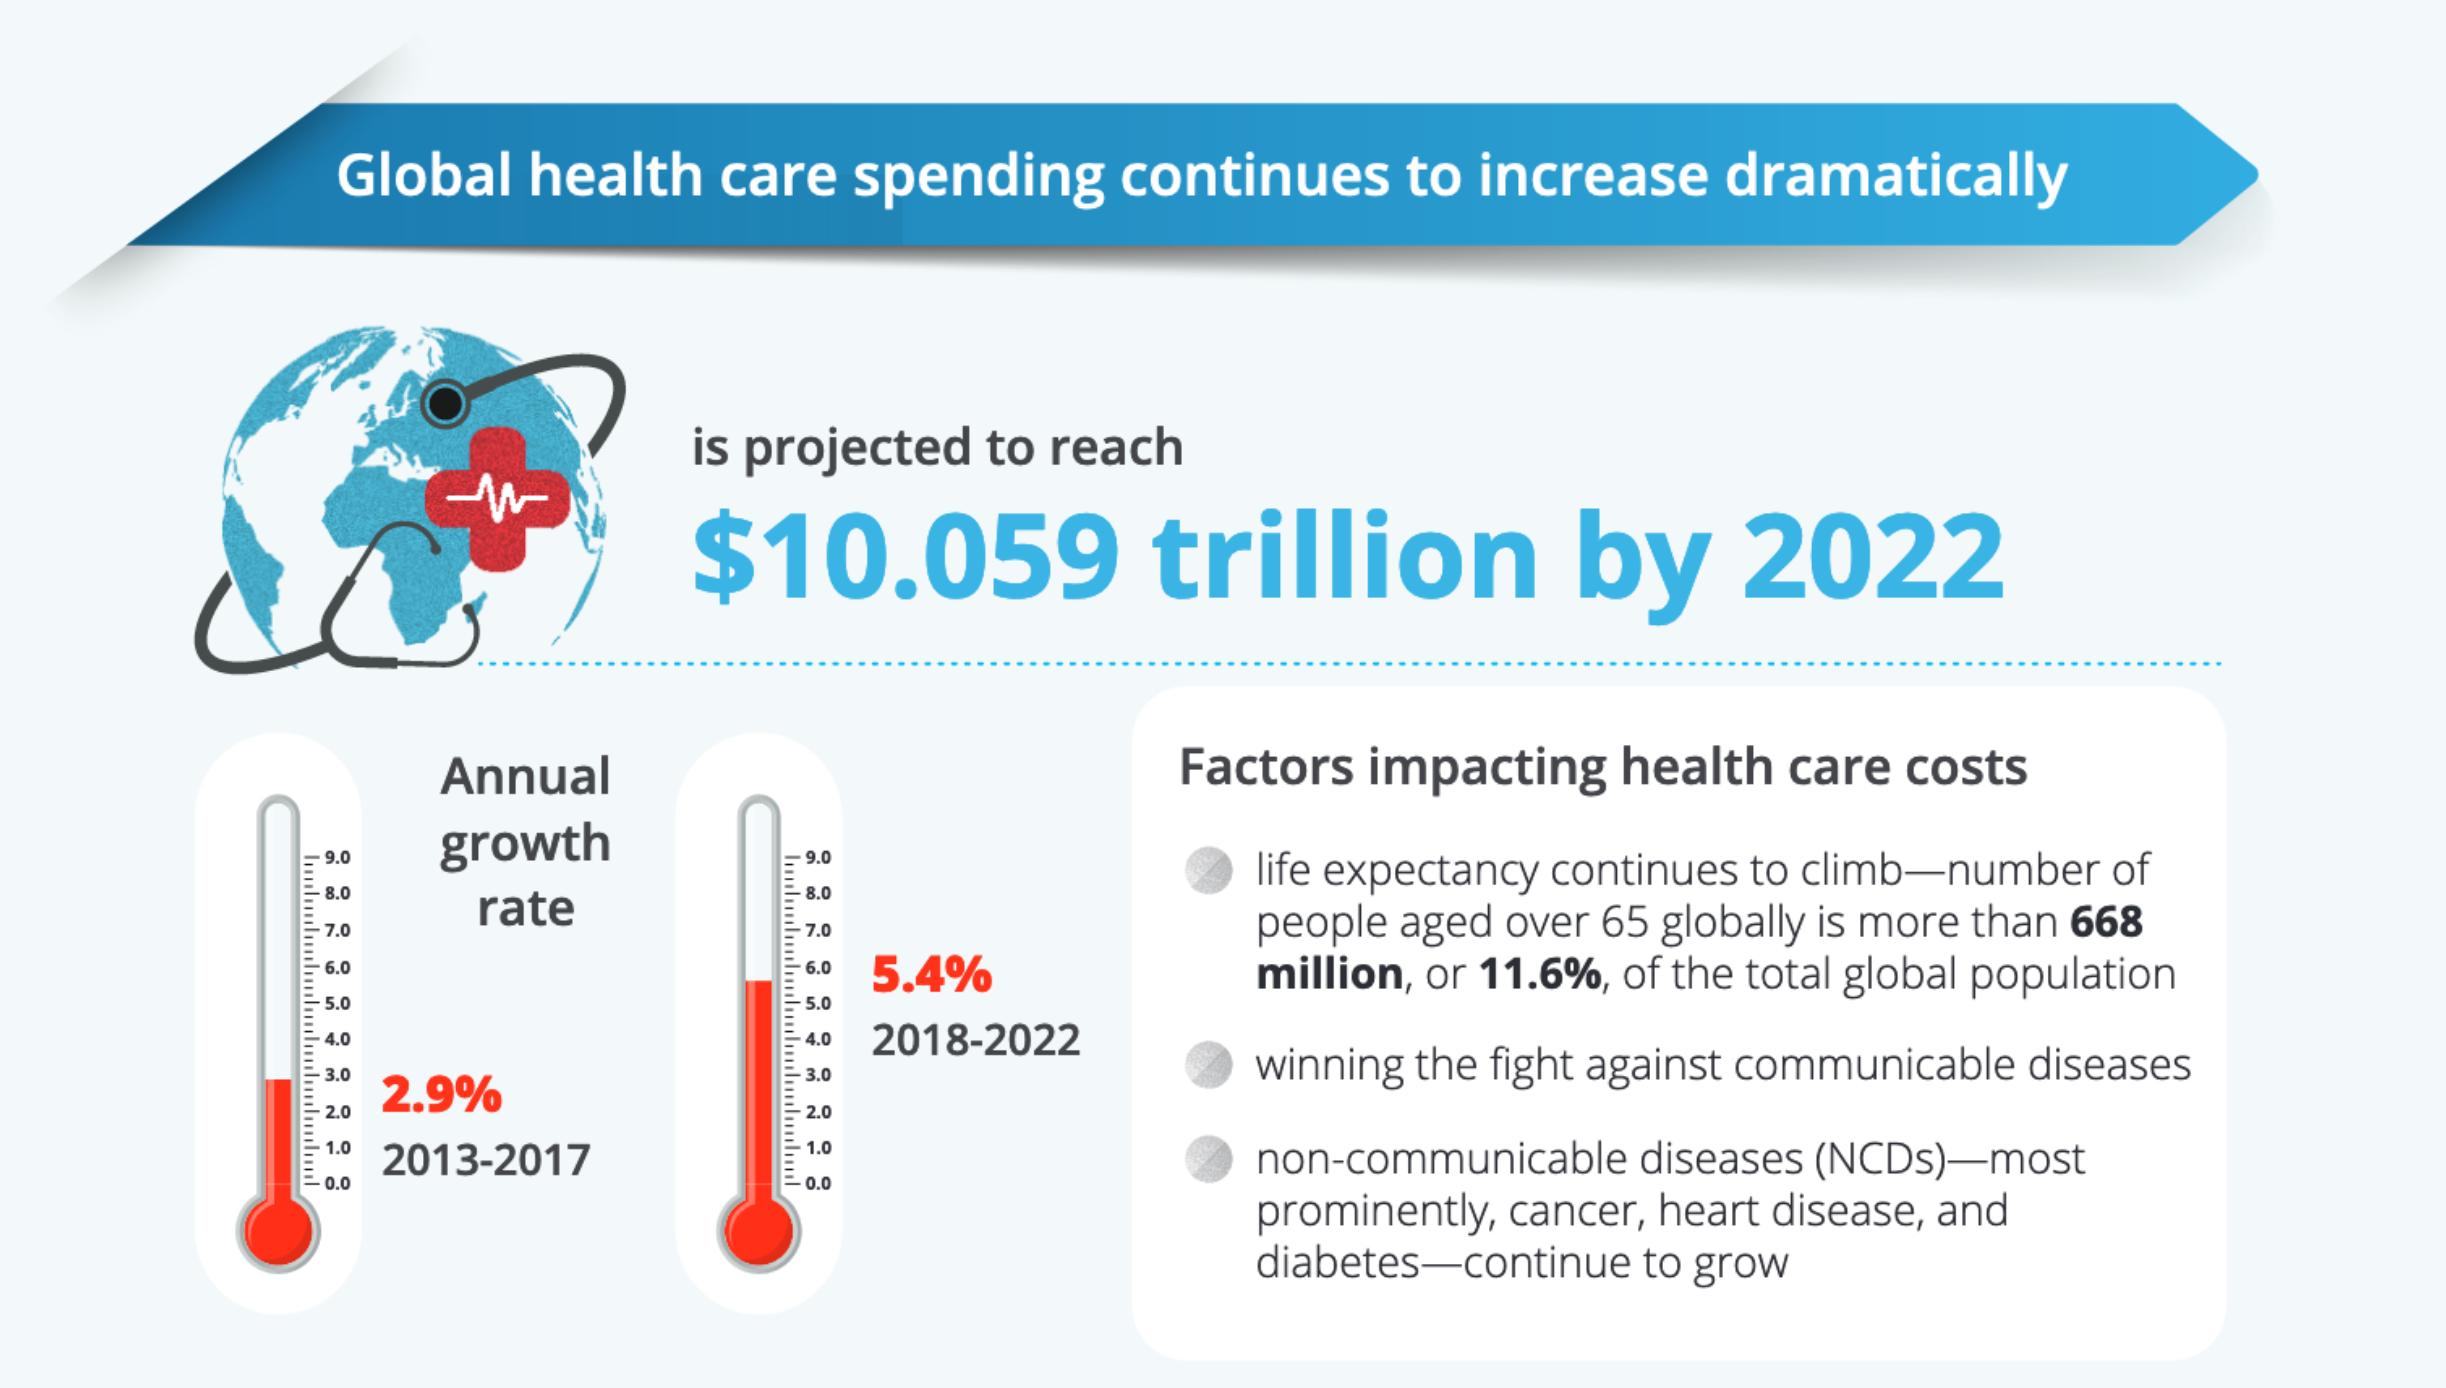 2018 Deloitte Global Health Care Outlook Report